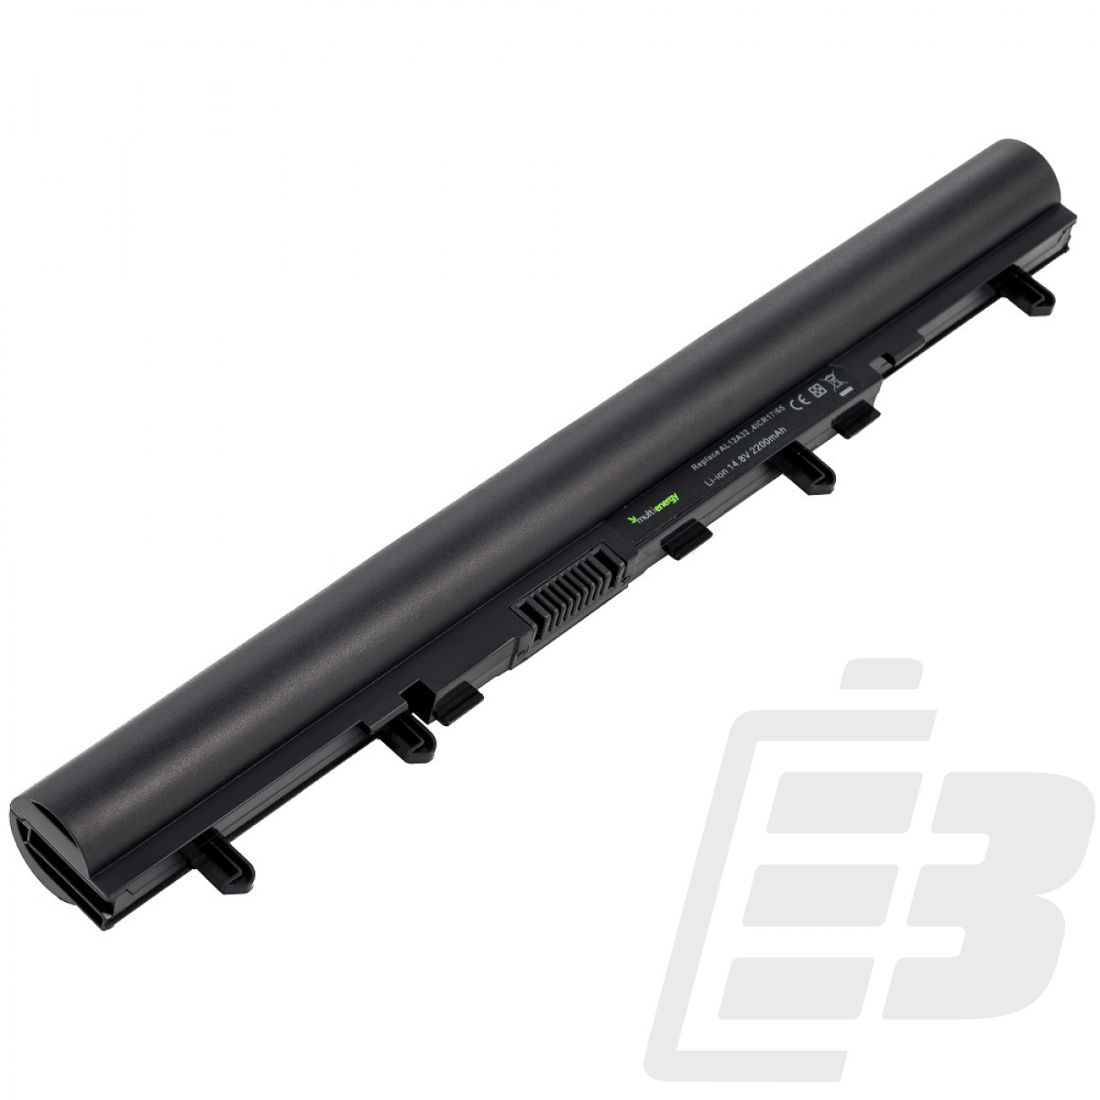 Laptop battery Acer Aspire V5_1